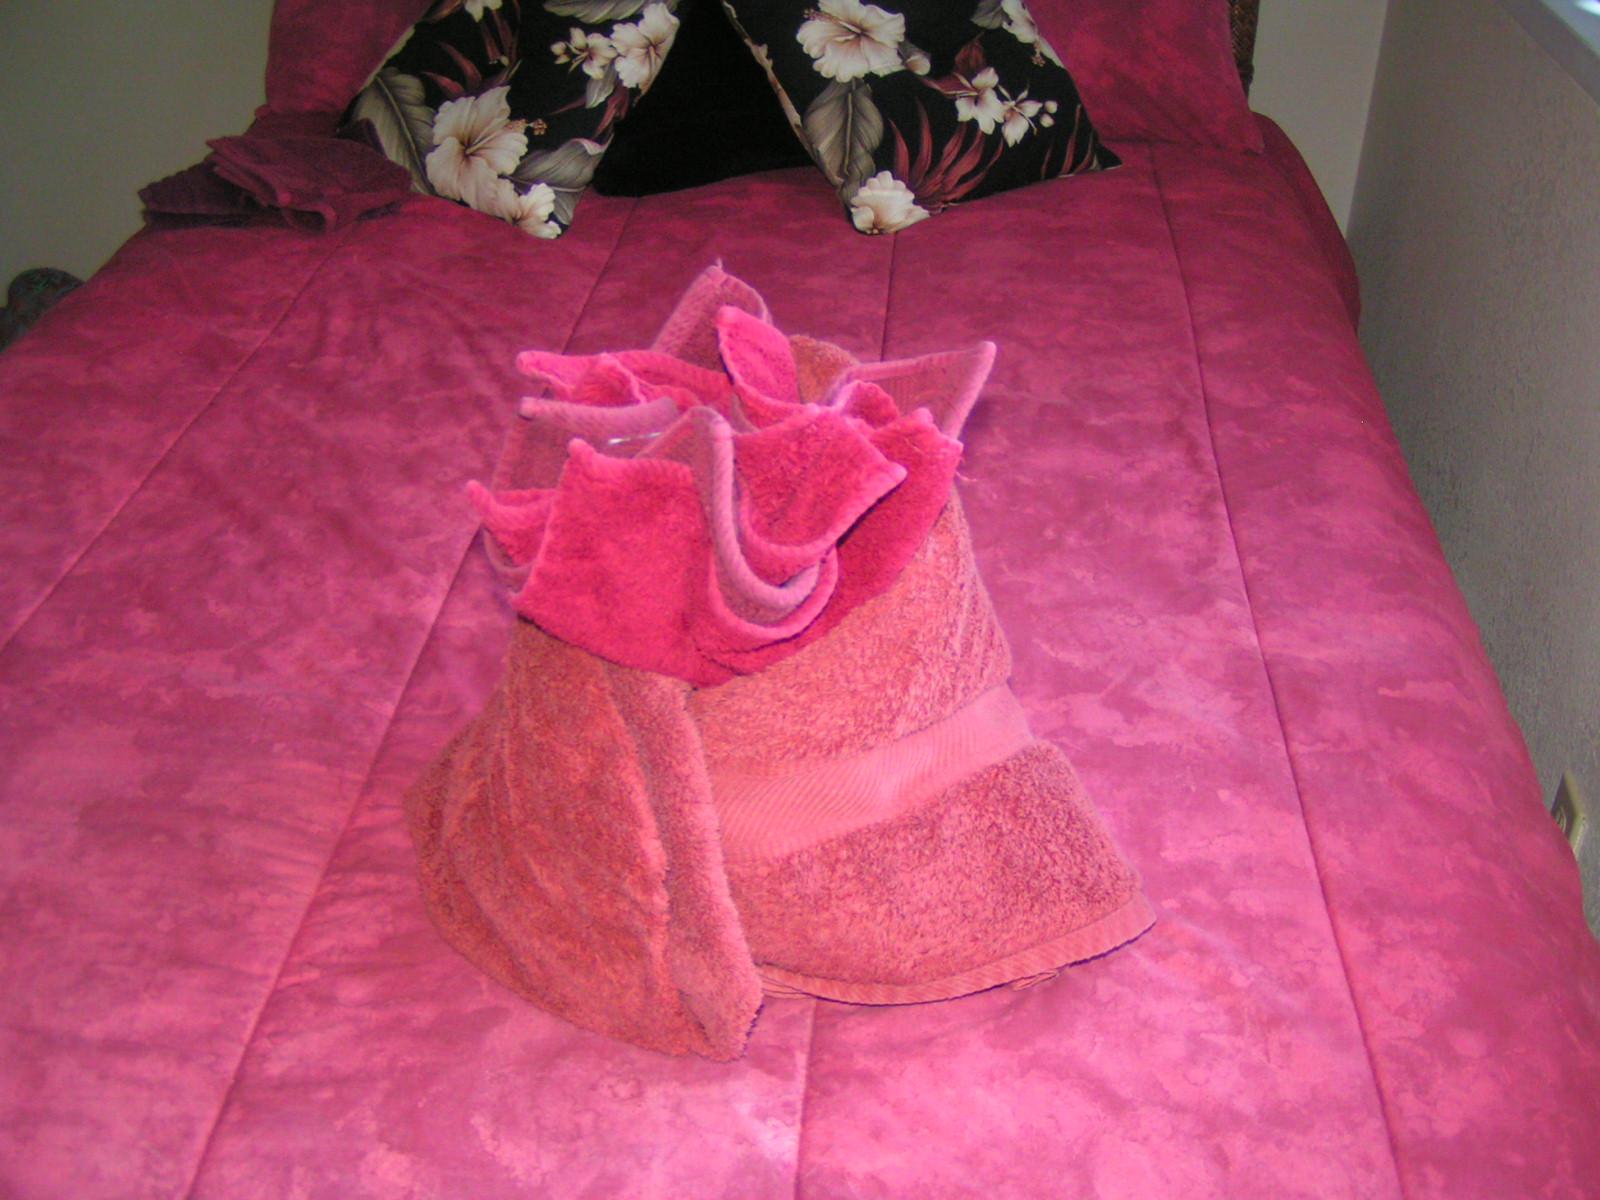 Origami Of Towels Like Never Before Odd Stuff Magazine